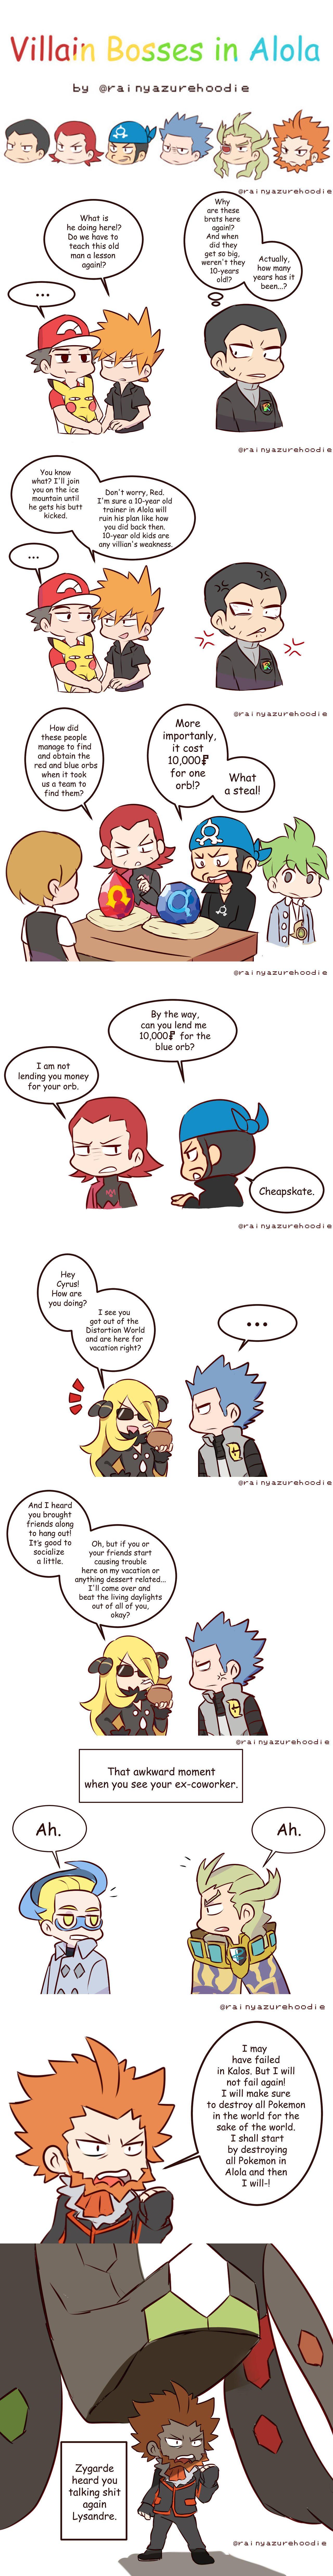 Haircut styles in pokemon sun and moon villain bosses in alola  meme moon and pokémon